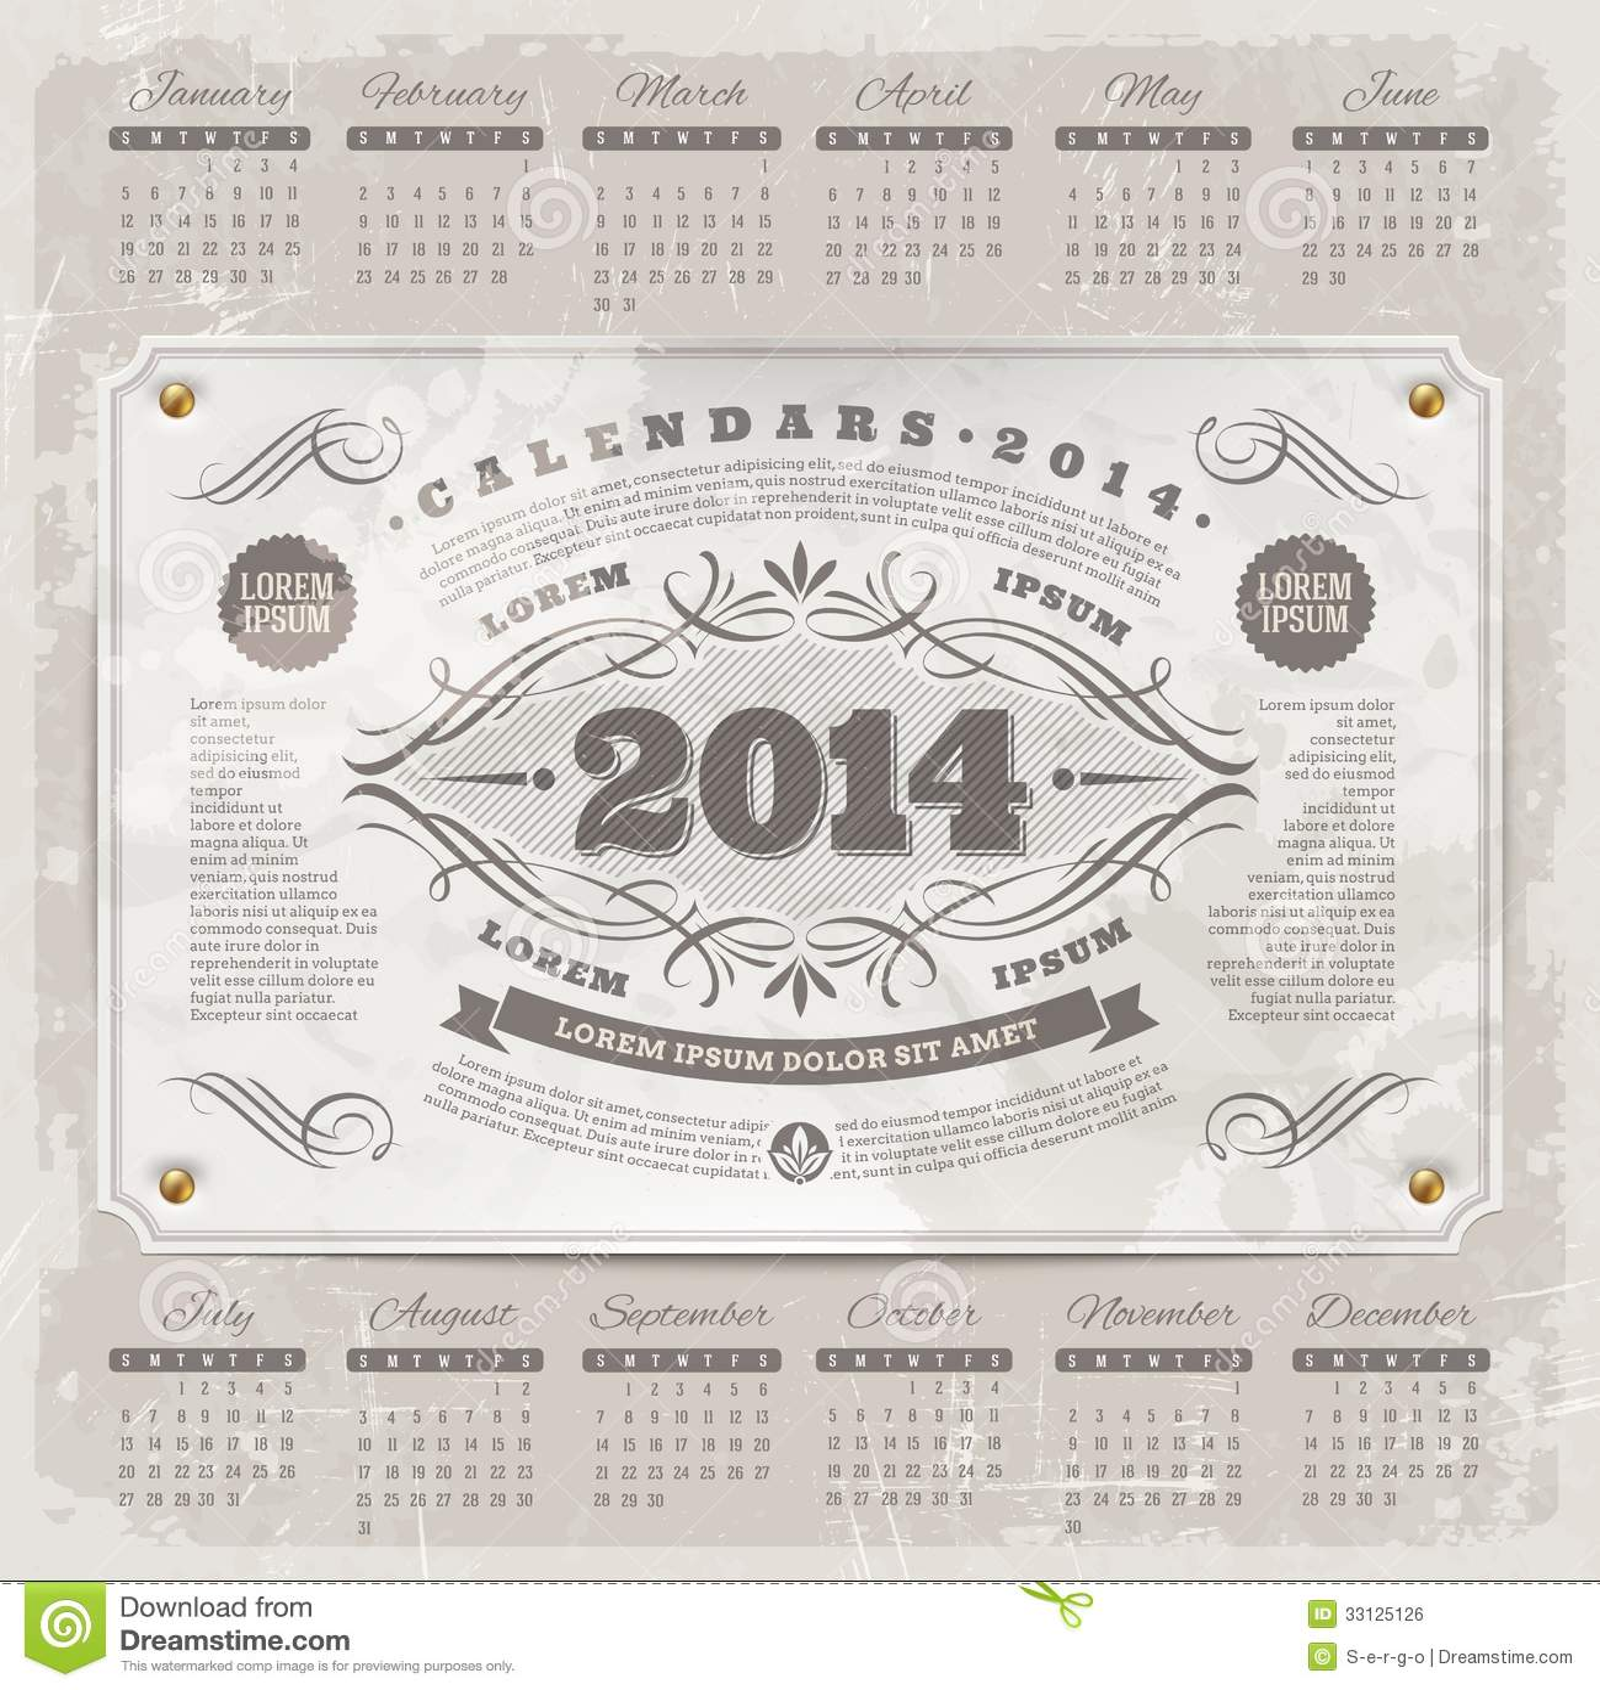 Vintage Calendar Template : Ornate vintage calendar of royalty free stock image